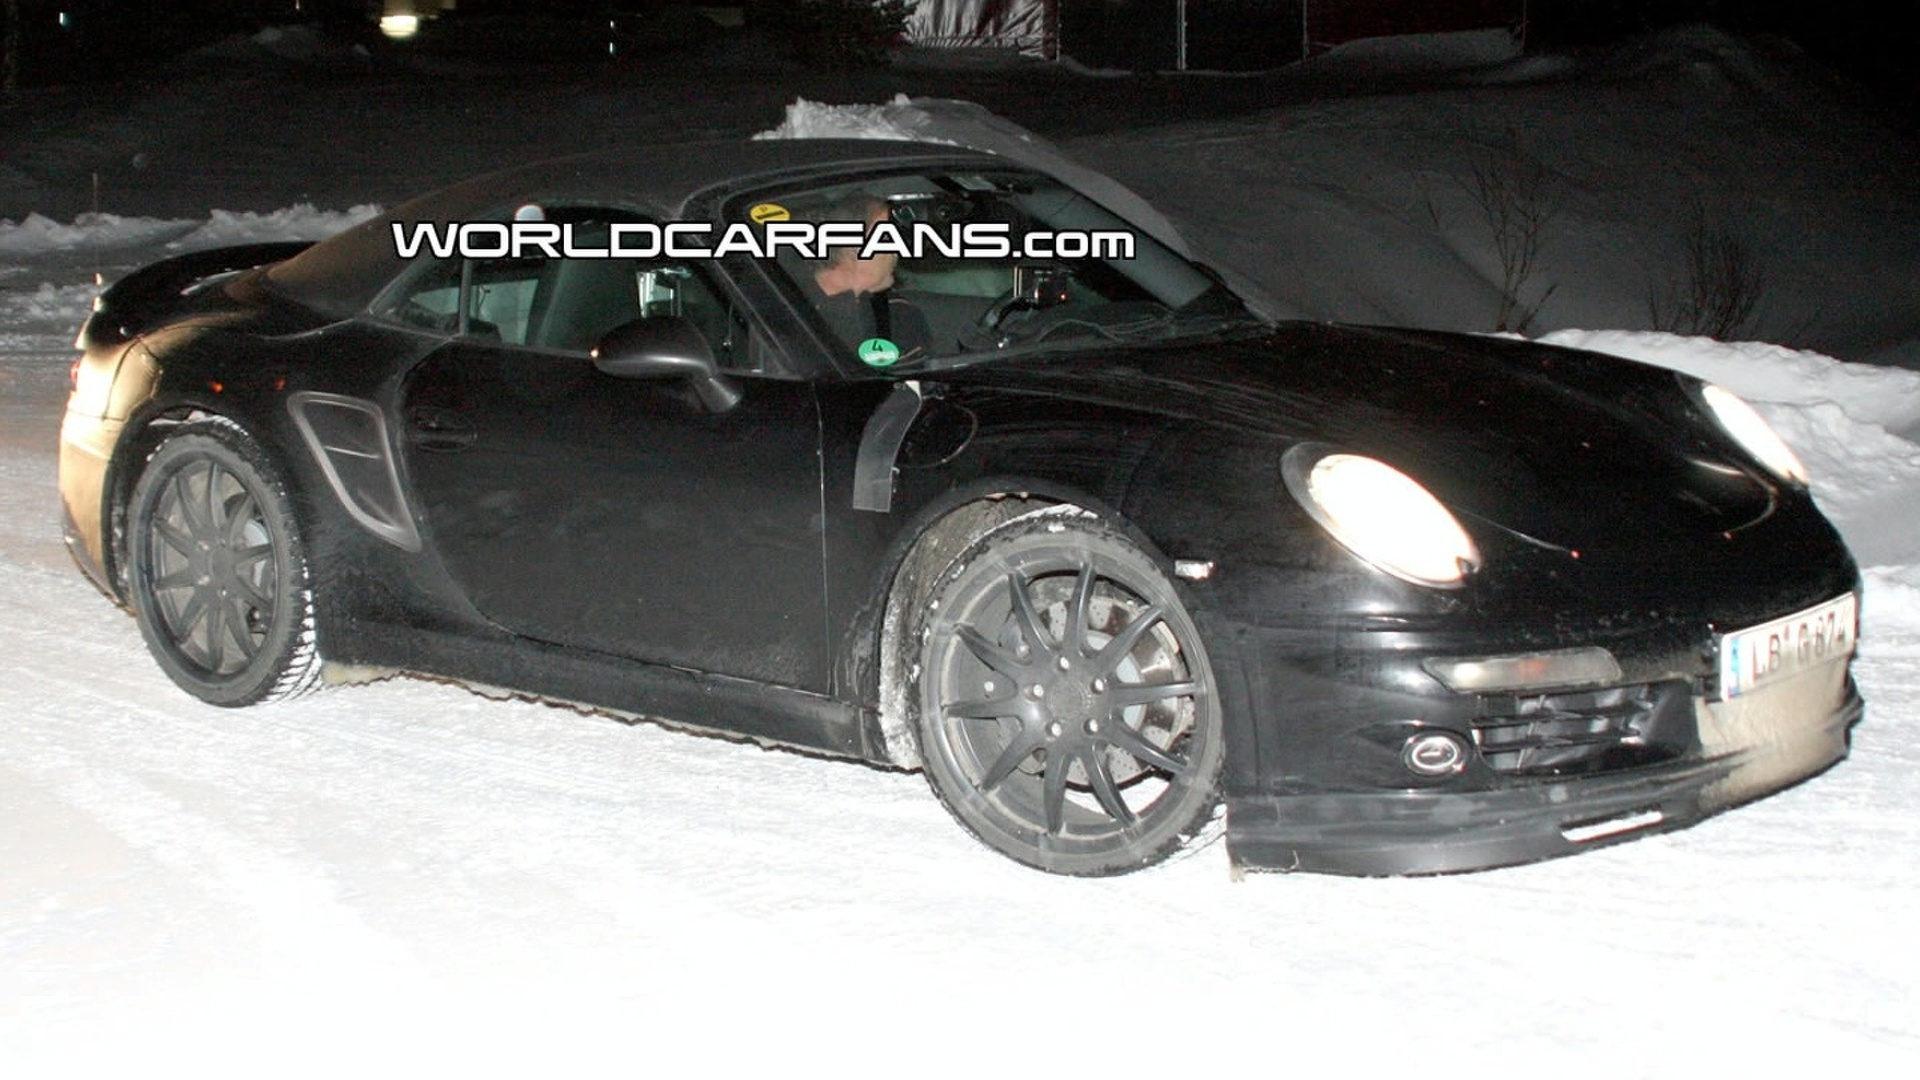 Porsche 911/998: First time on video